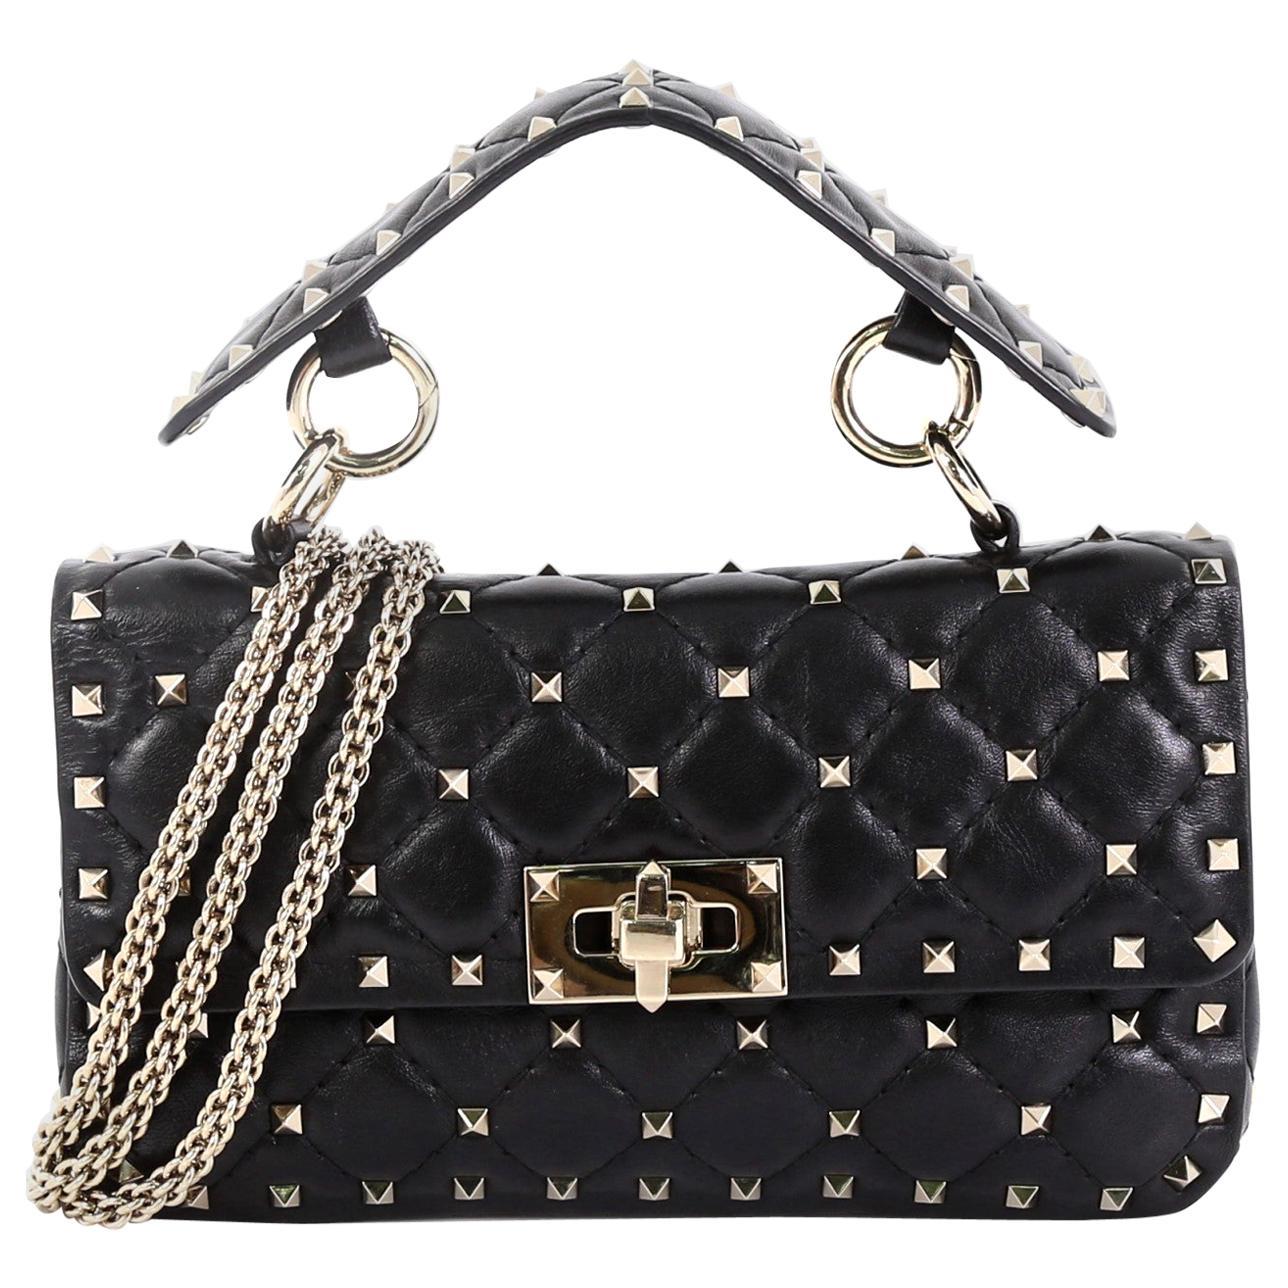 8224c7b5002615 Vintage Valentino Handbags and Purses - 322 For Sale at 1stdibs